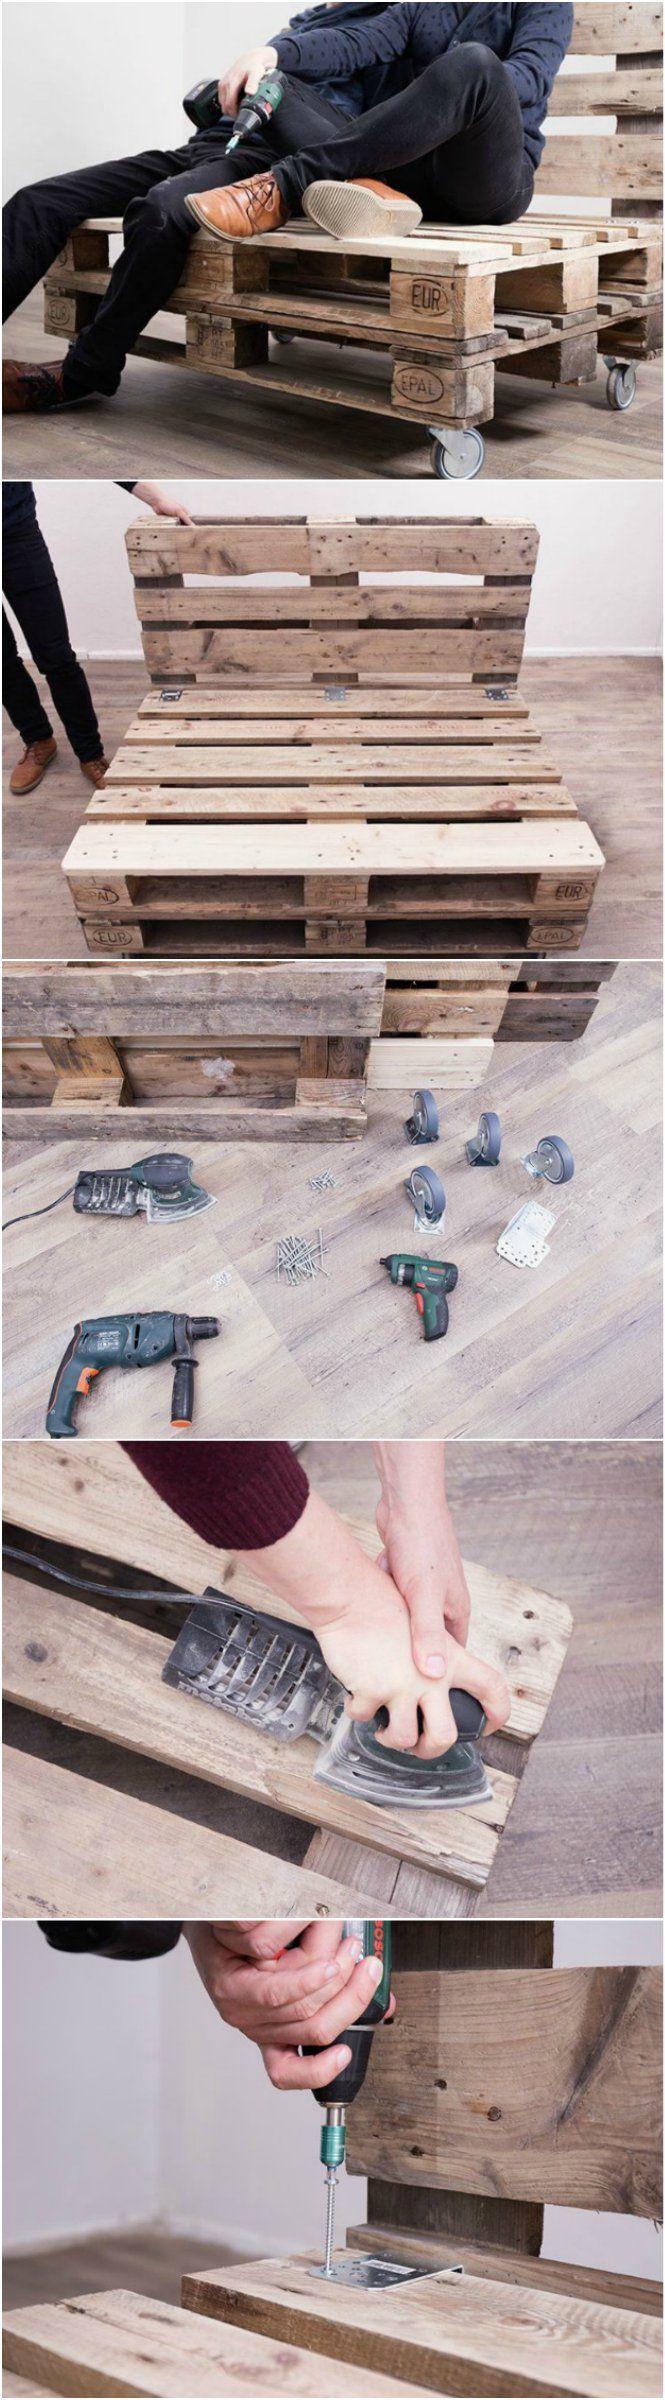 DIY tutorial: Make A Pallet Sofa via DaWanda.com in 2020 ...